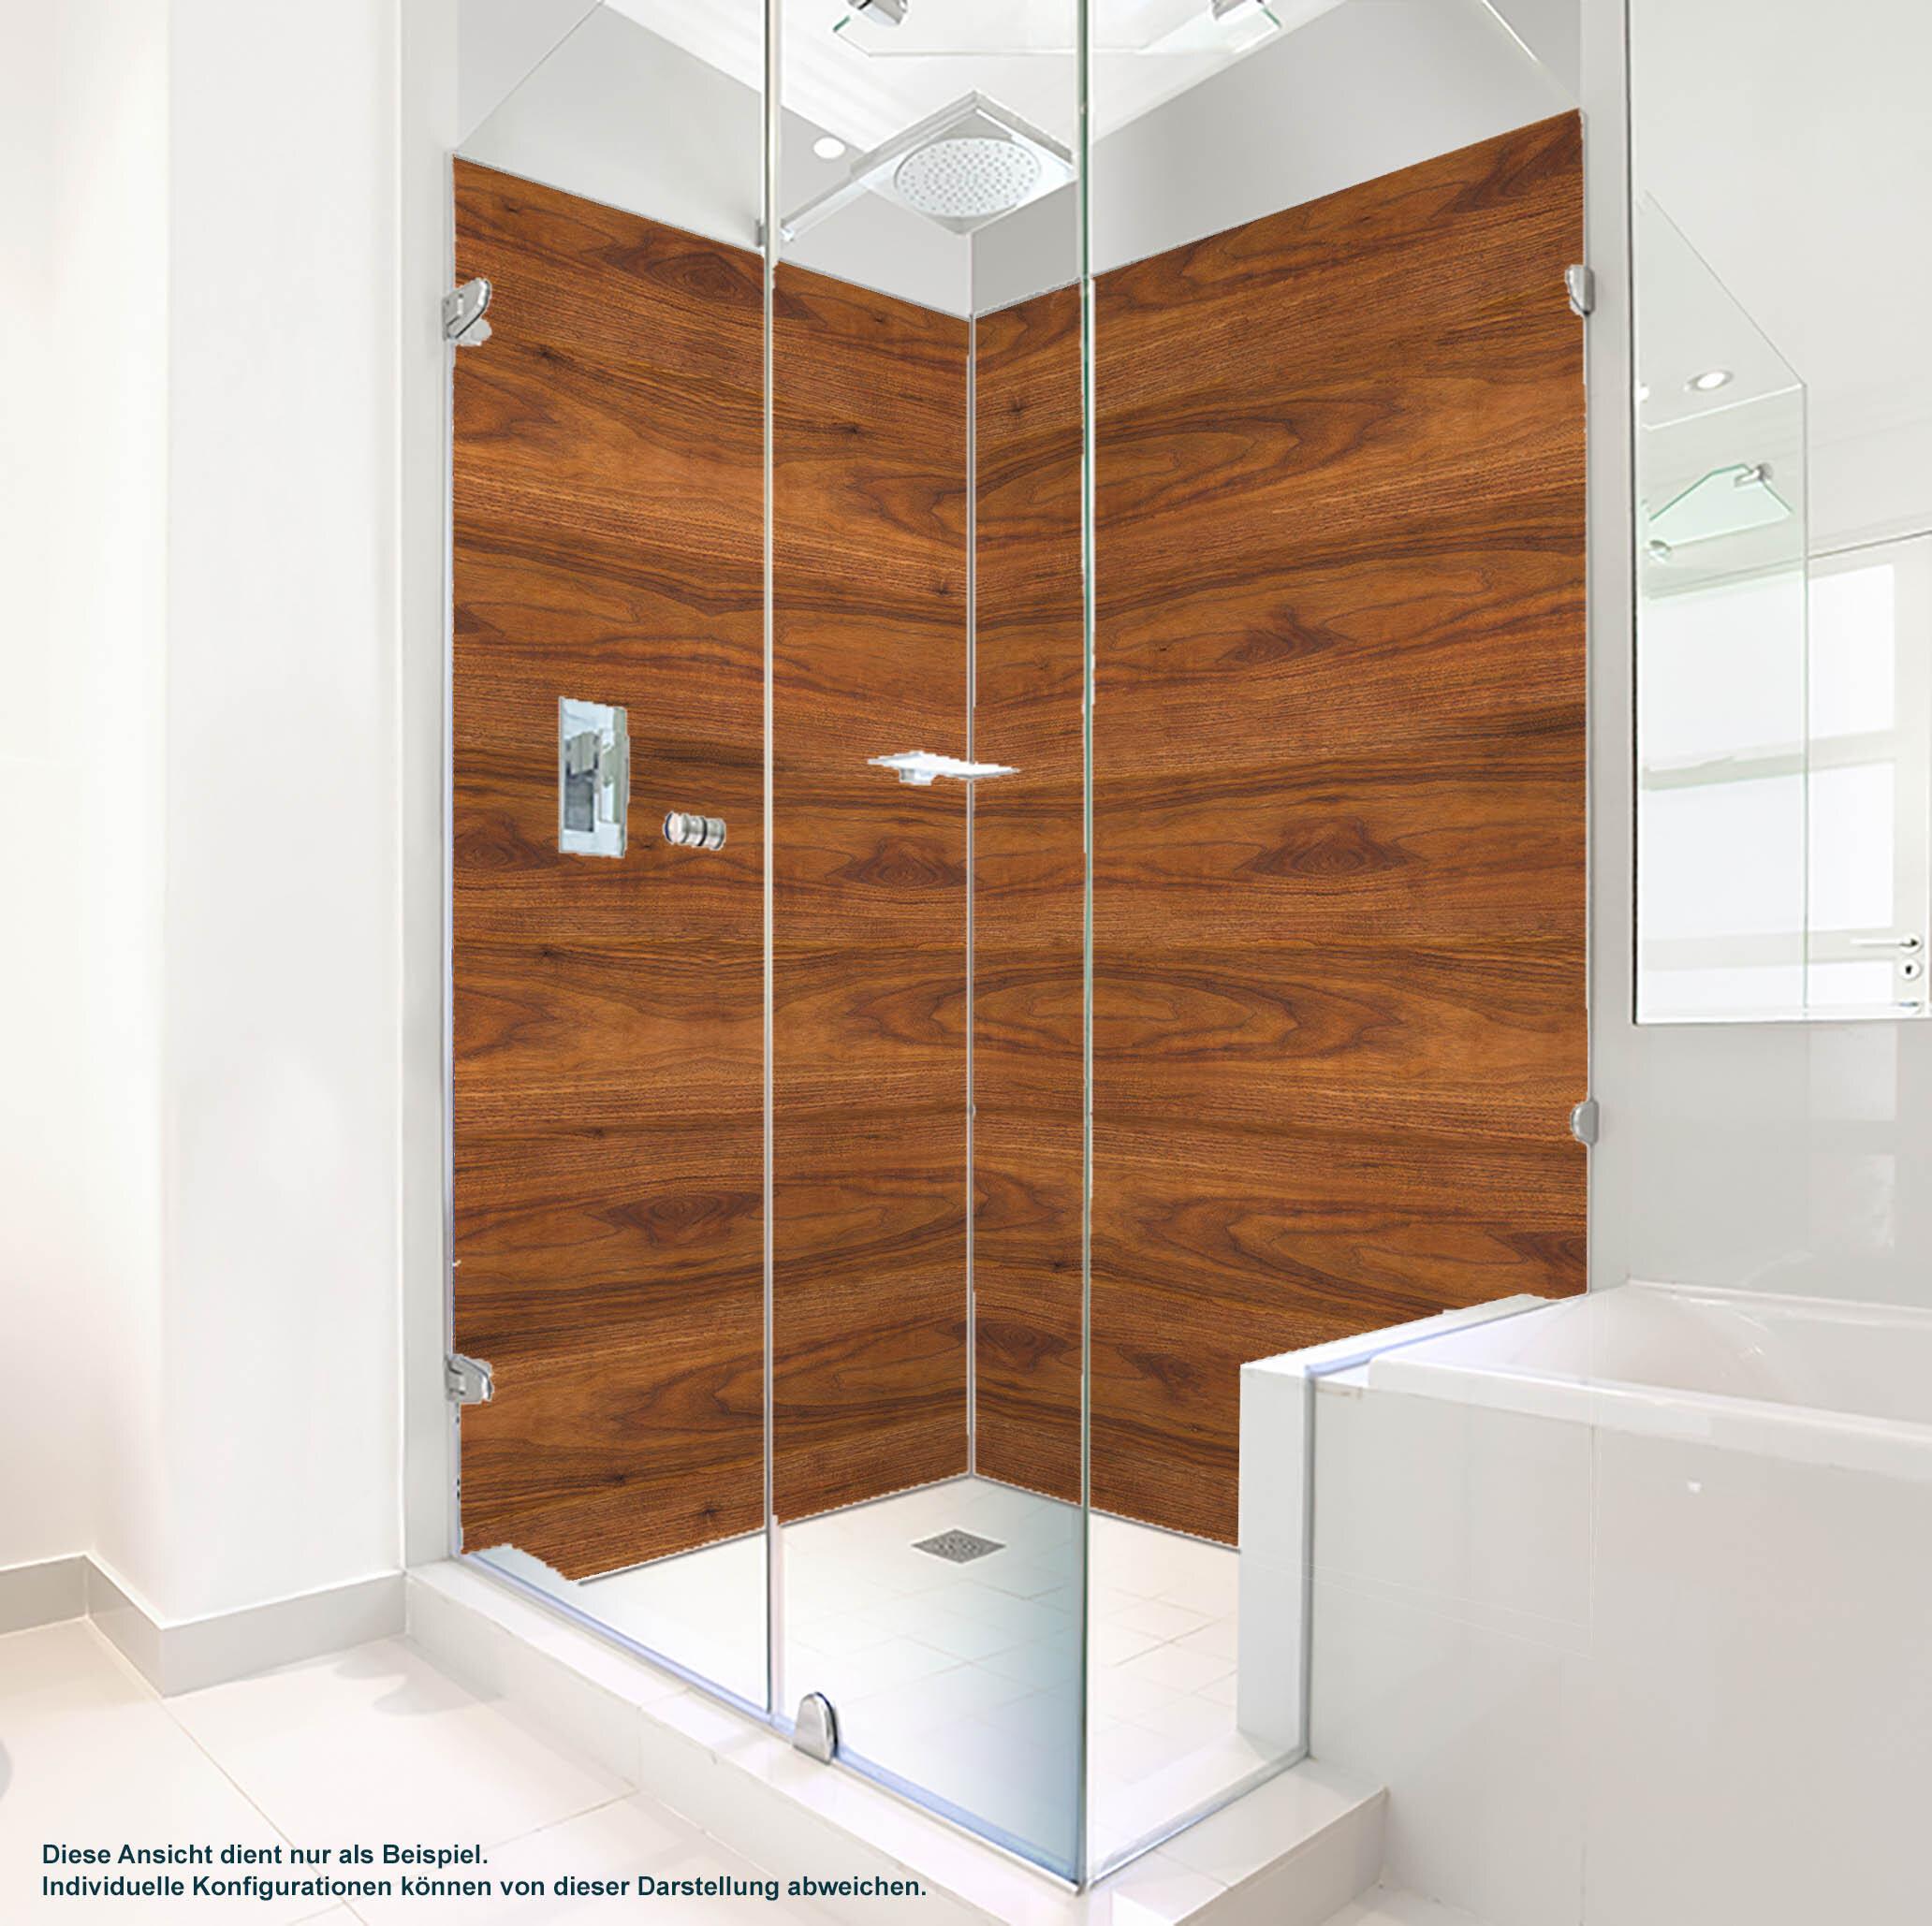 Dusche PlateART Duschrückwand mit Motiv Holzoptik